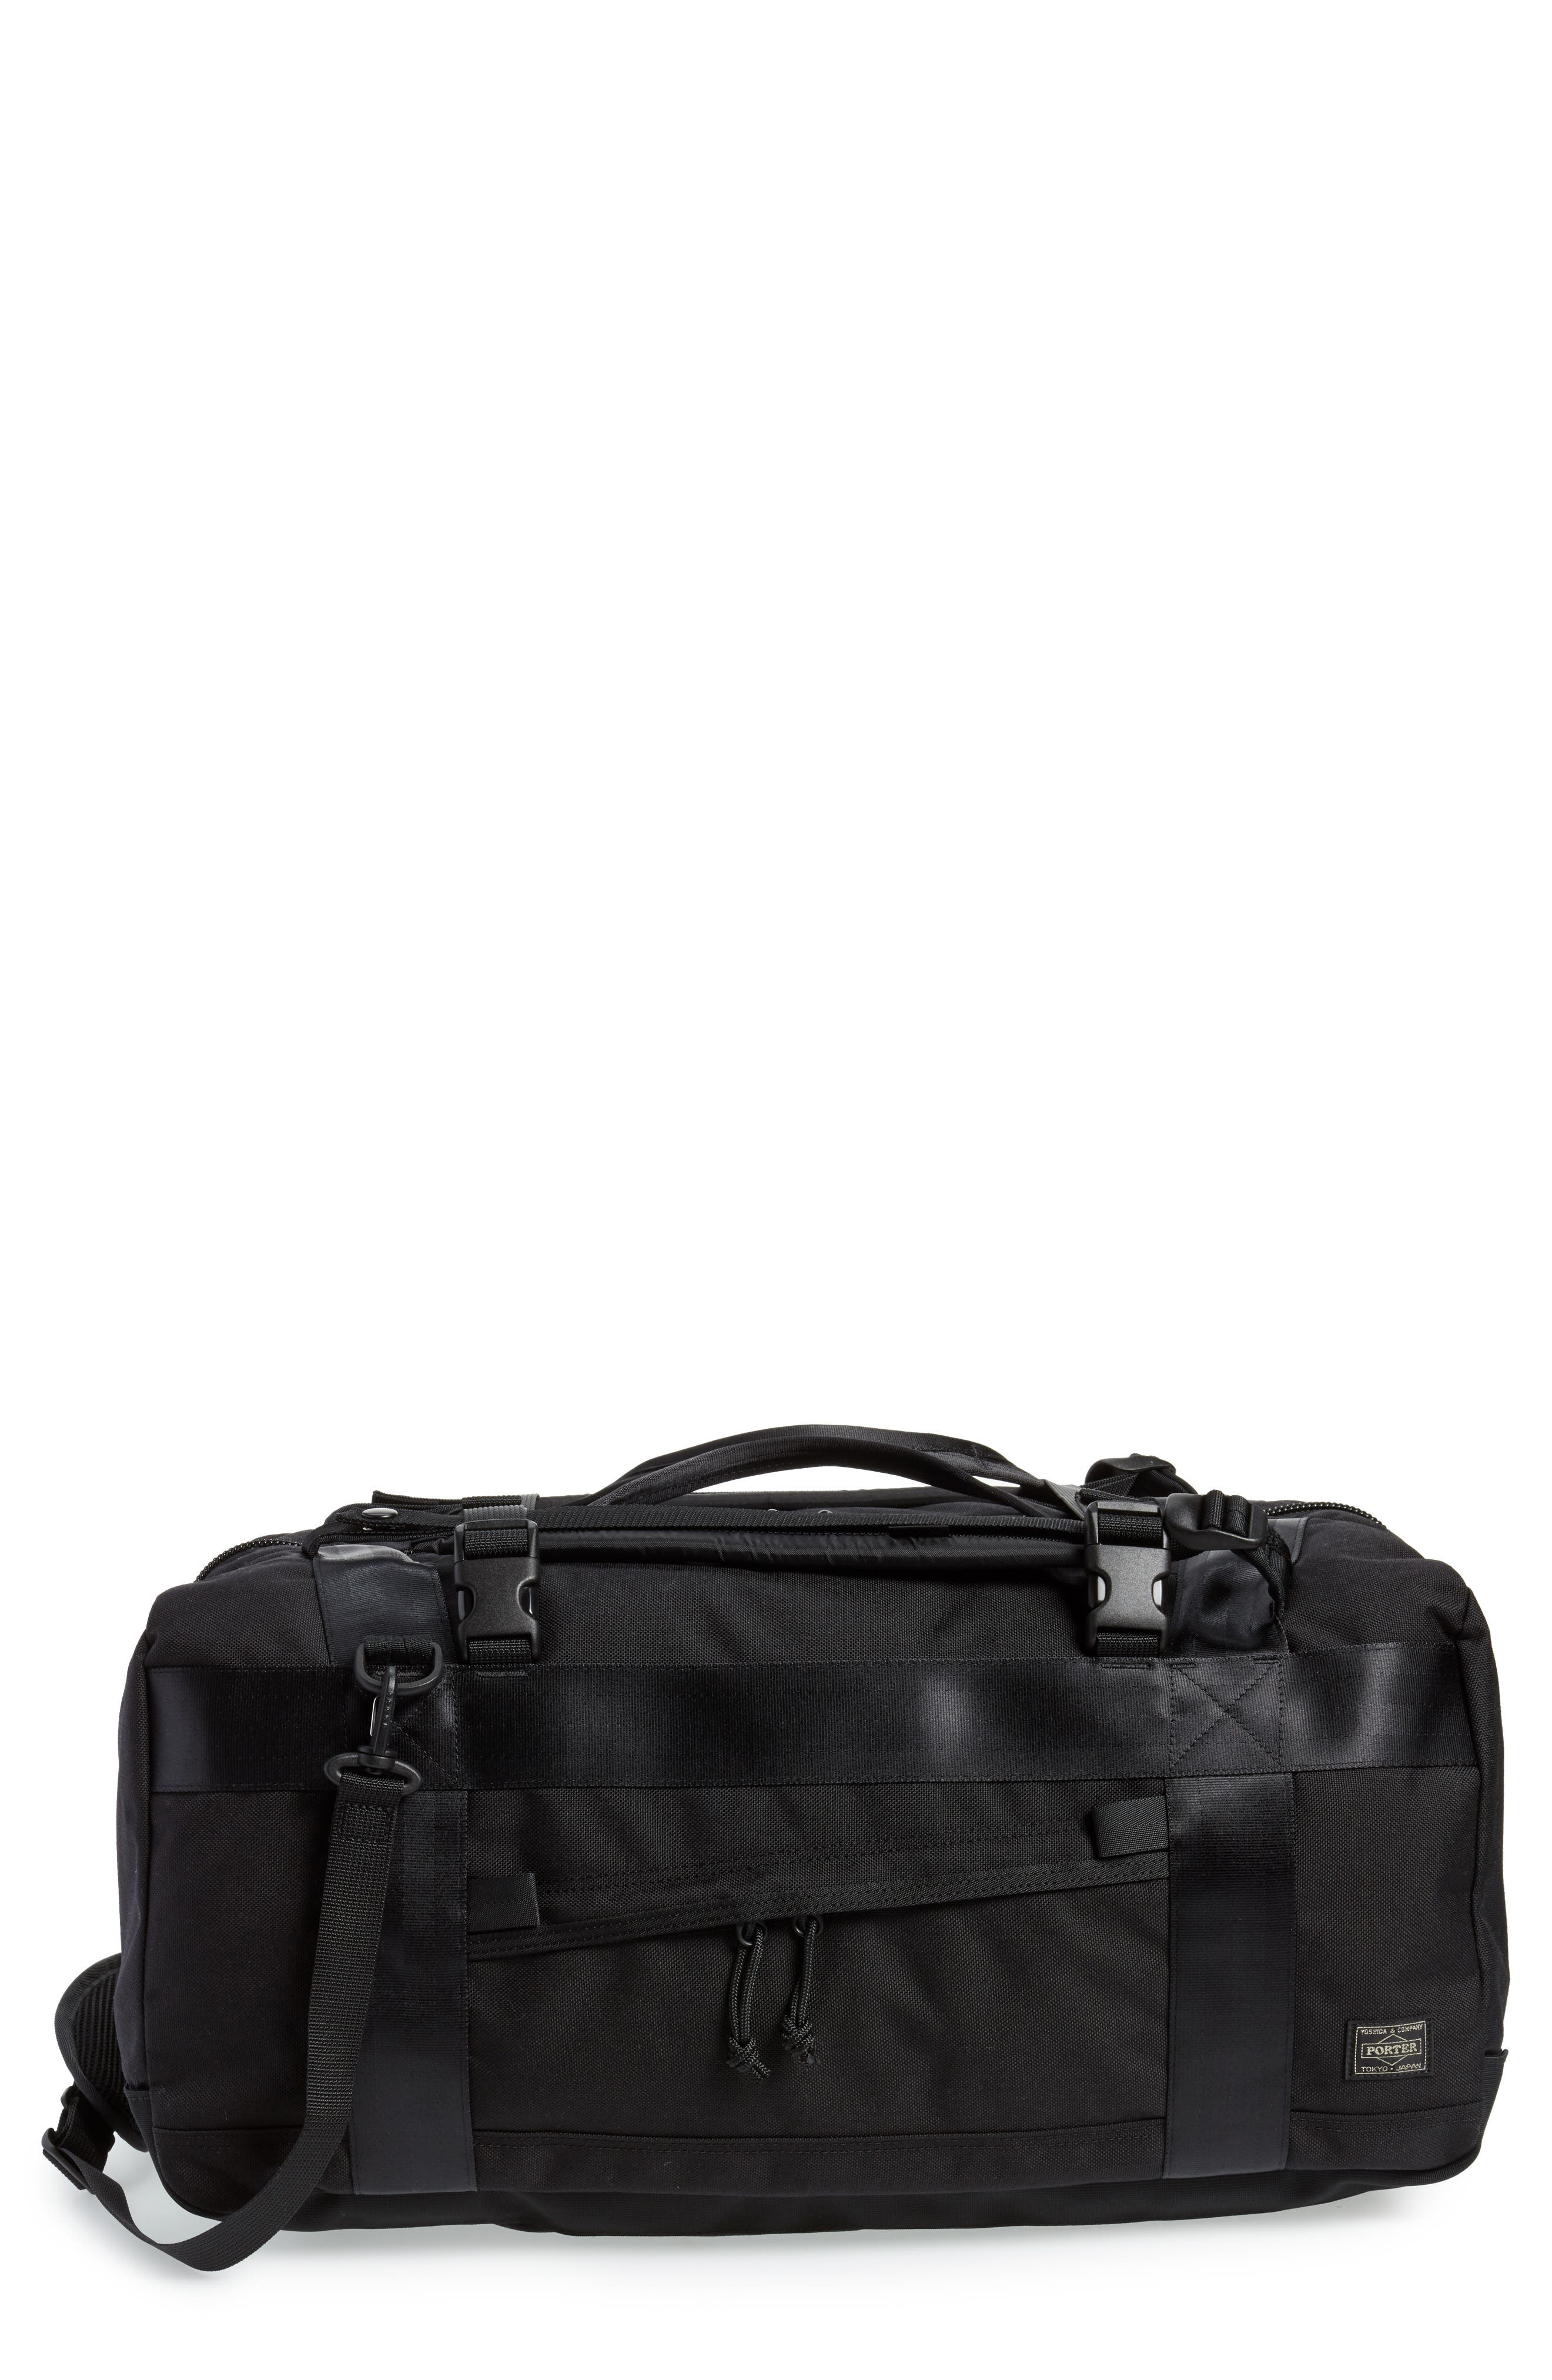 Porter-Yoshida & Co. Boothpack Convertible Duffel Bag,                             Main thumbnail 1, color,                             001